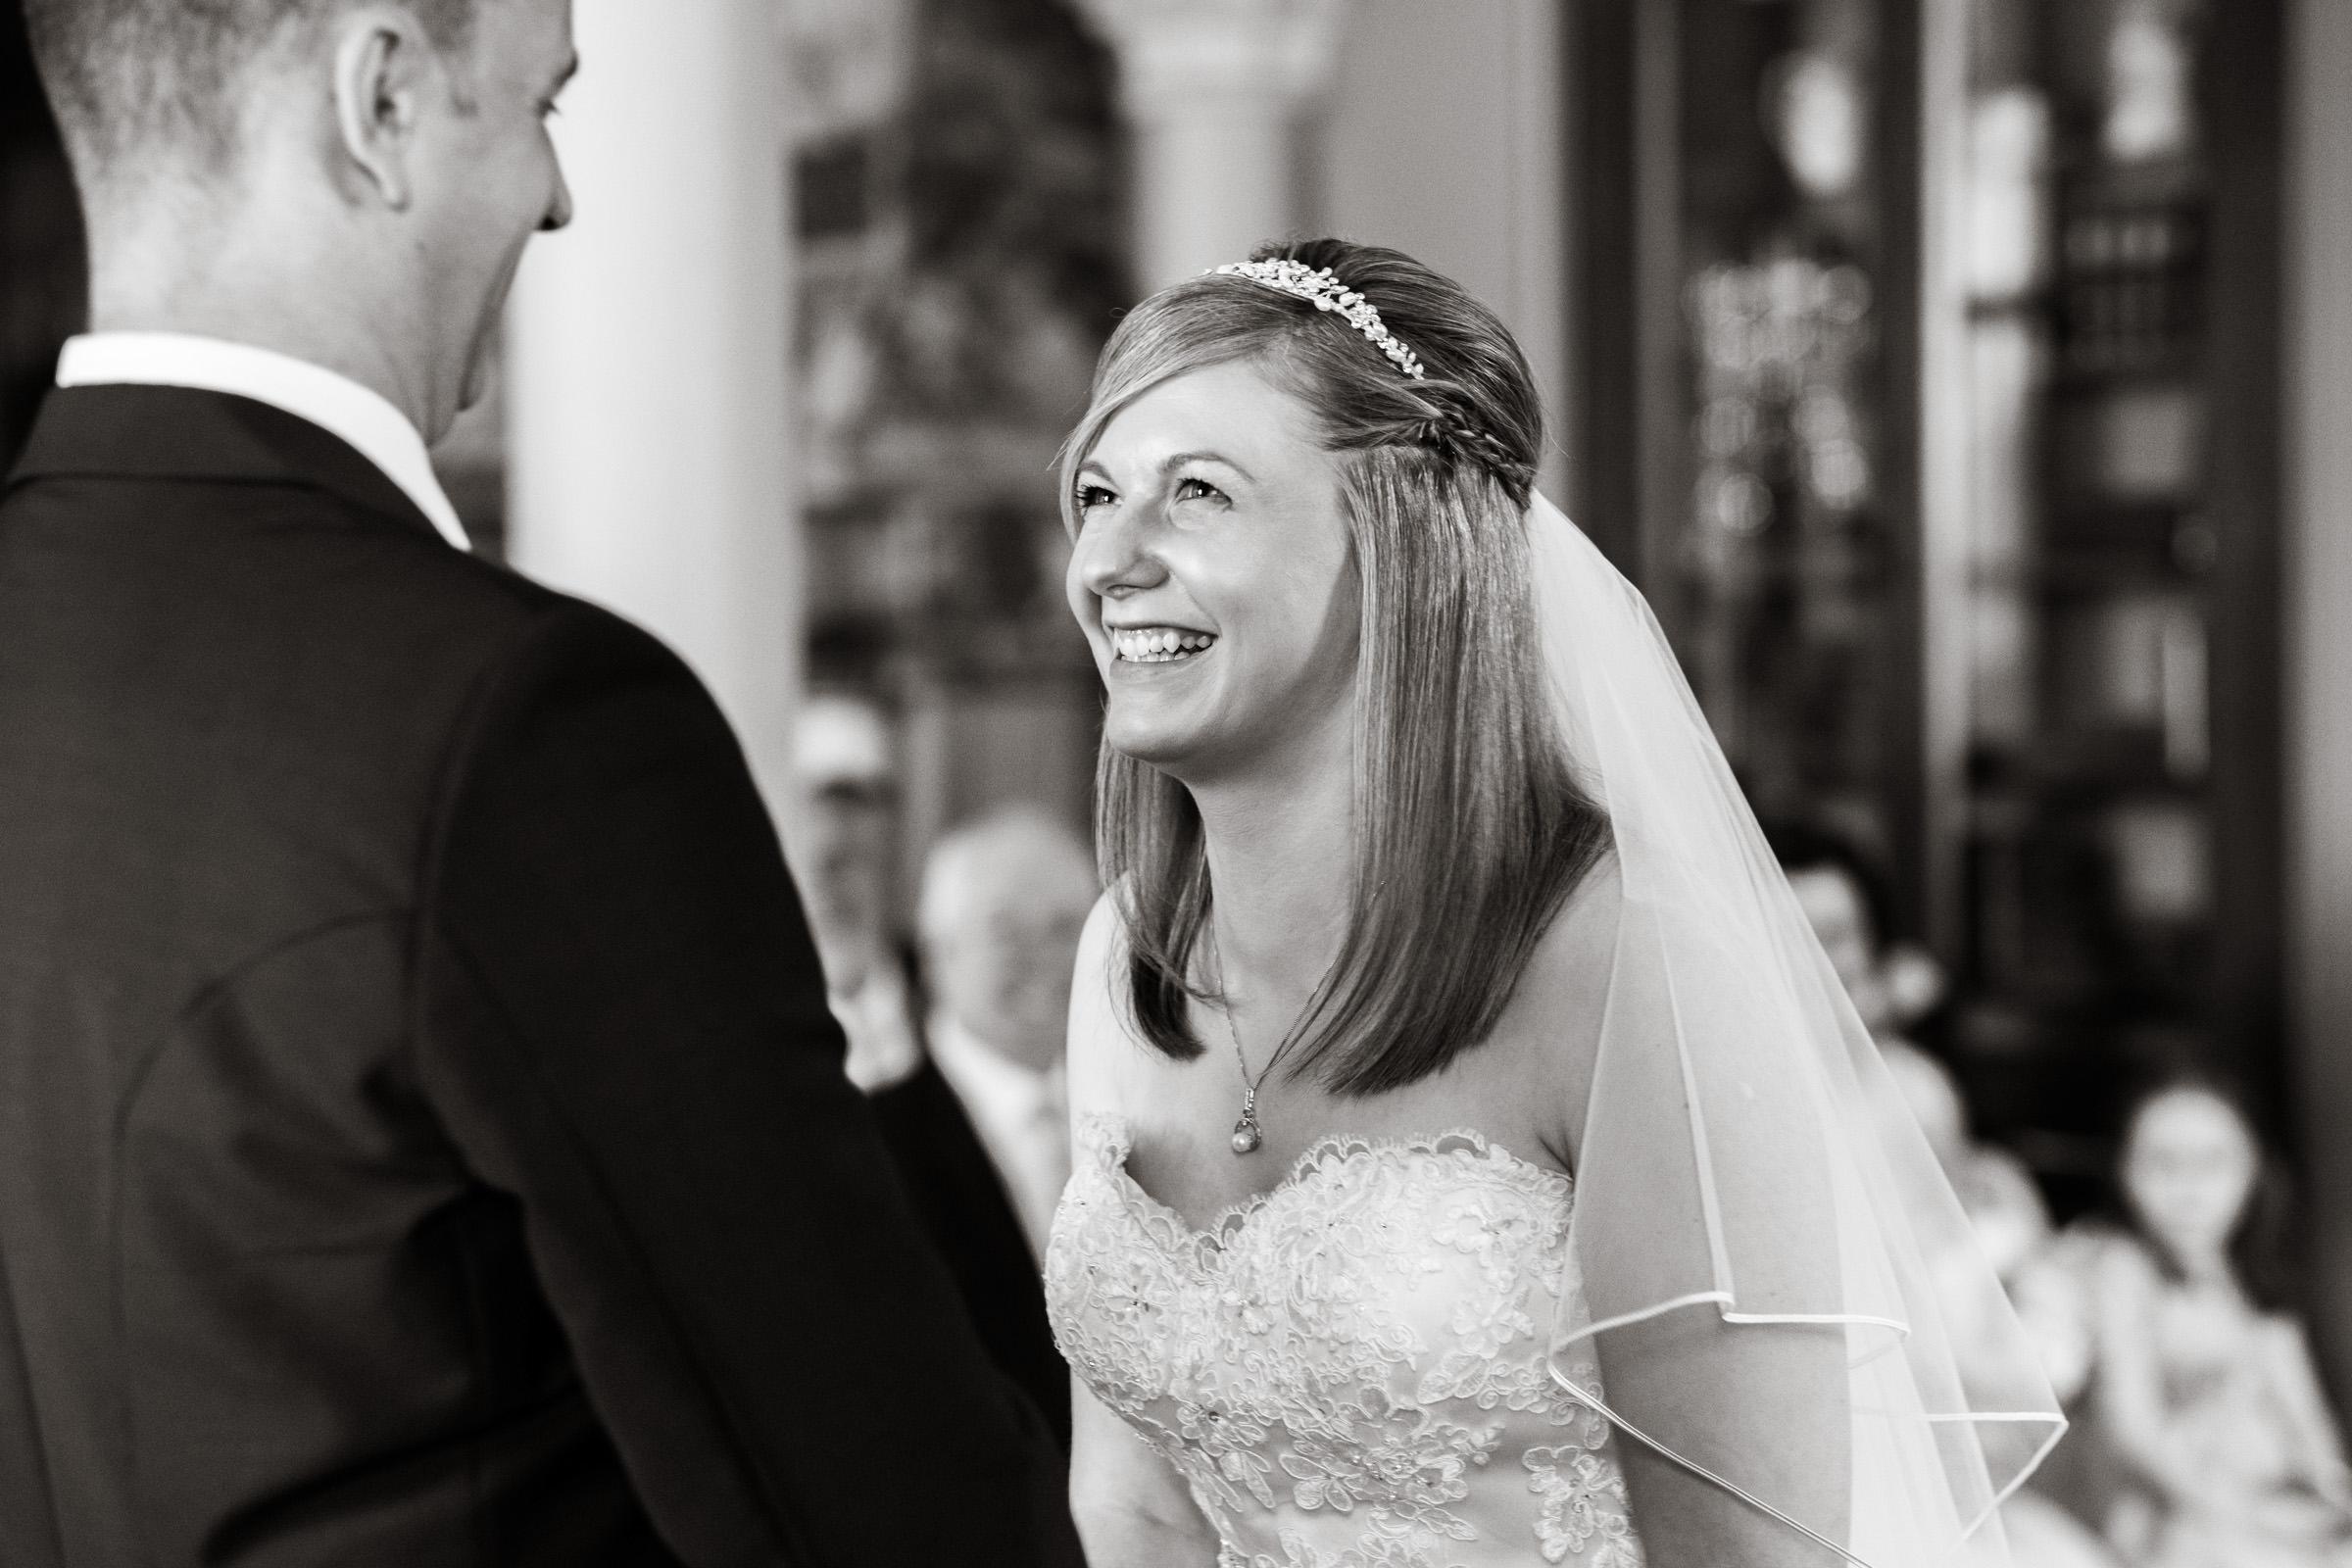 Donna & Nick's Wedding at Wotton House in Dorking 009.jpg